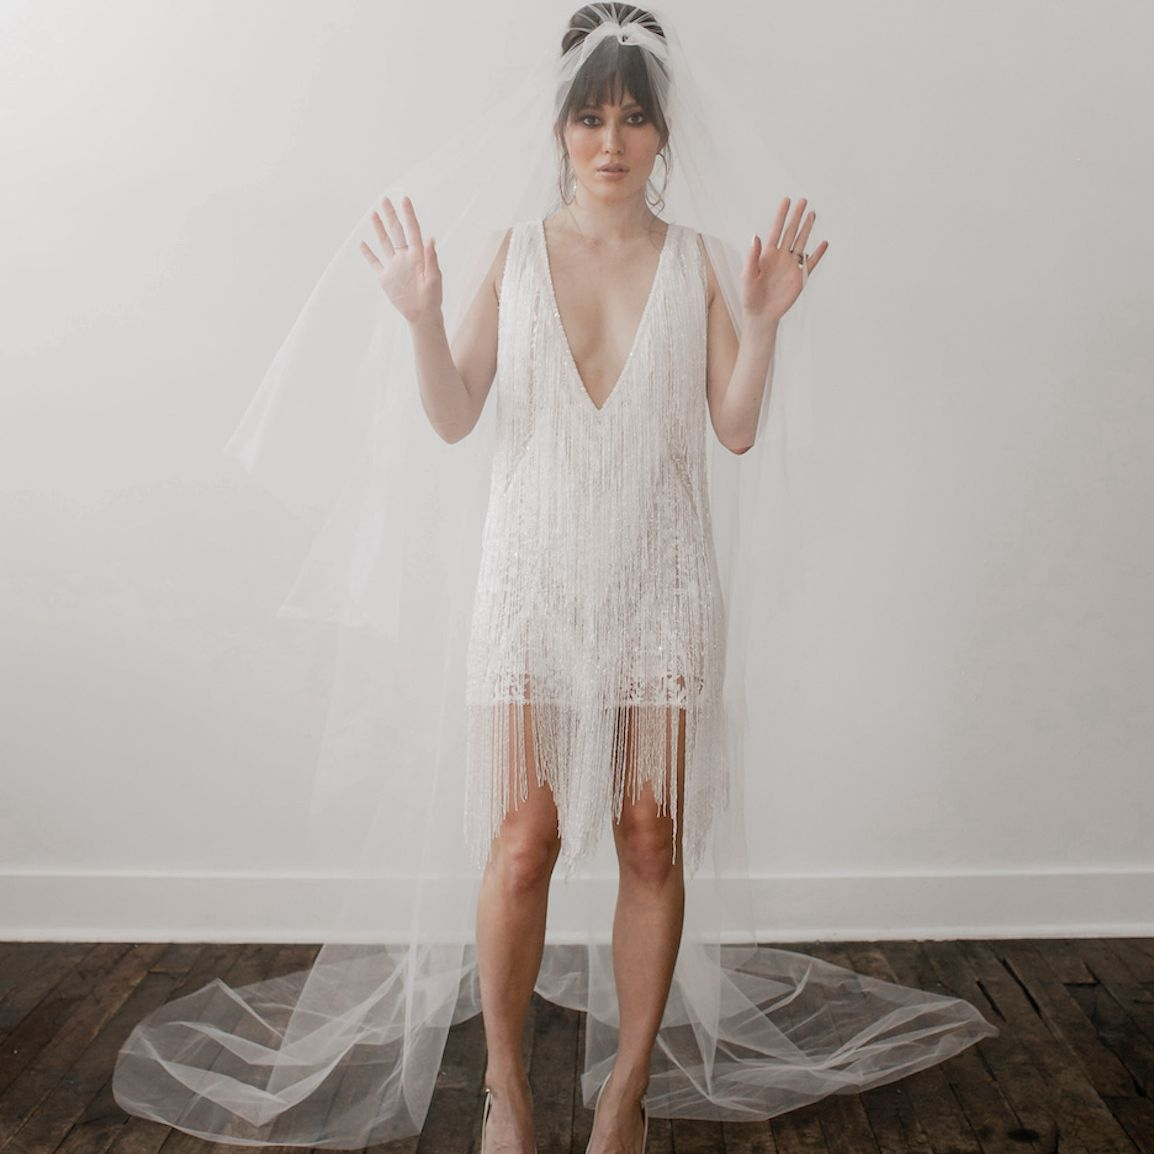 Model wearing Varca Bridal short white wedding dress with fringe and floor length veil